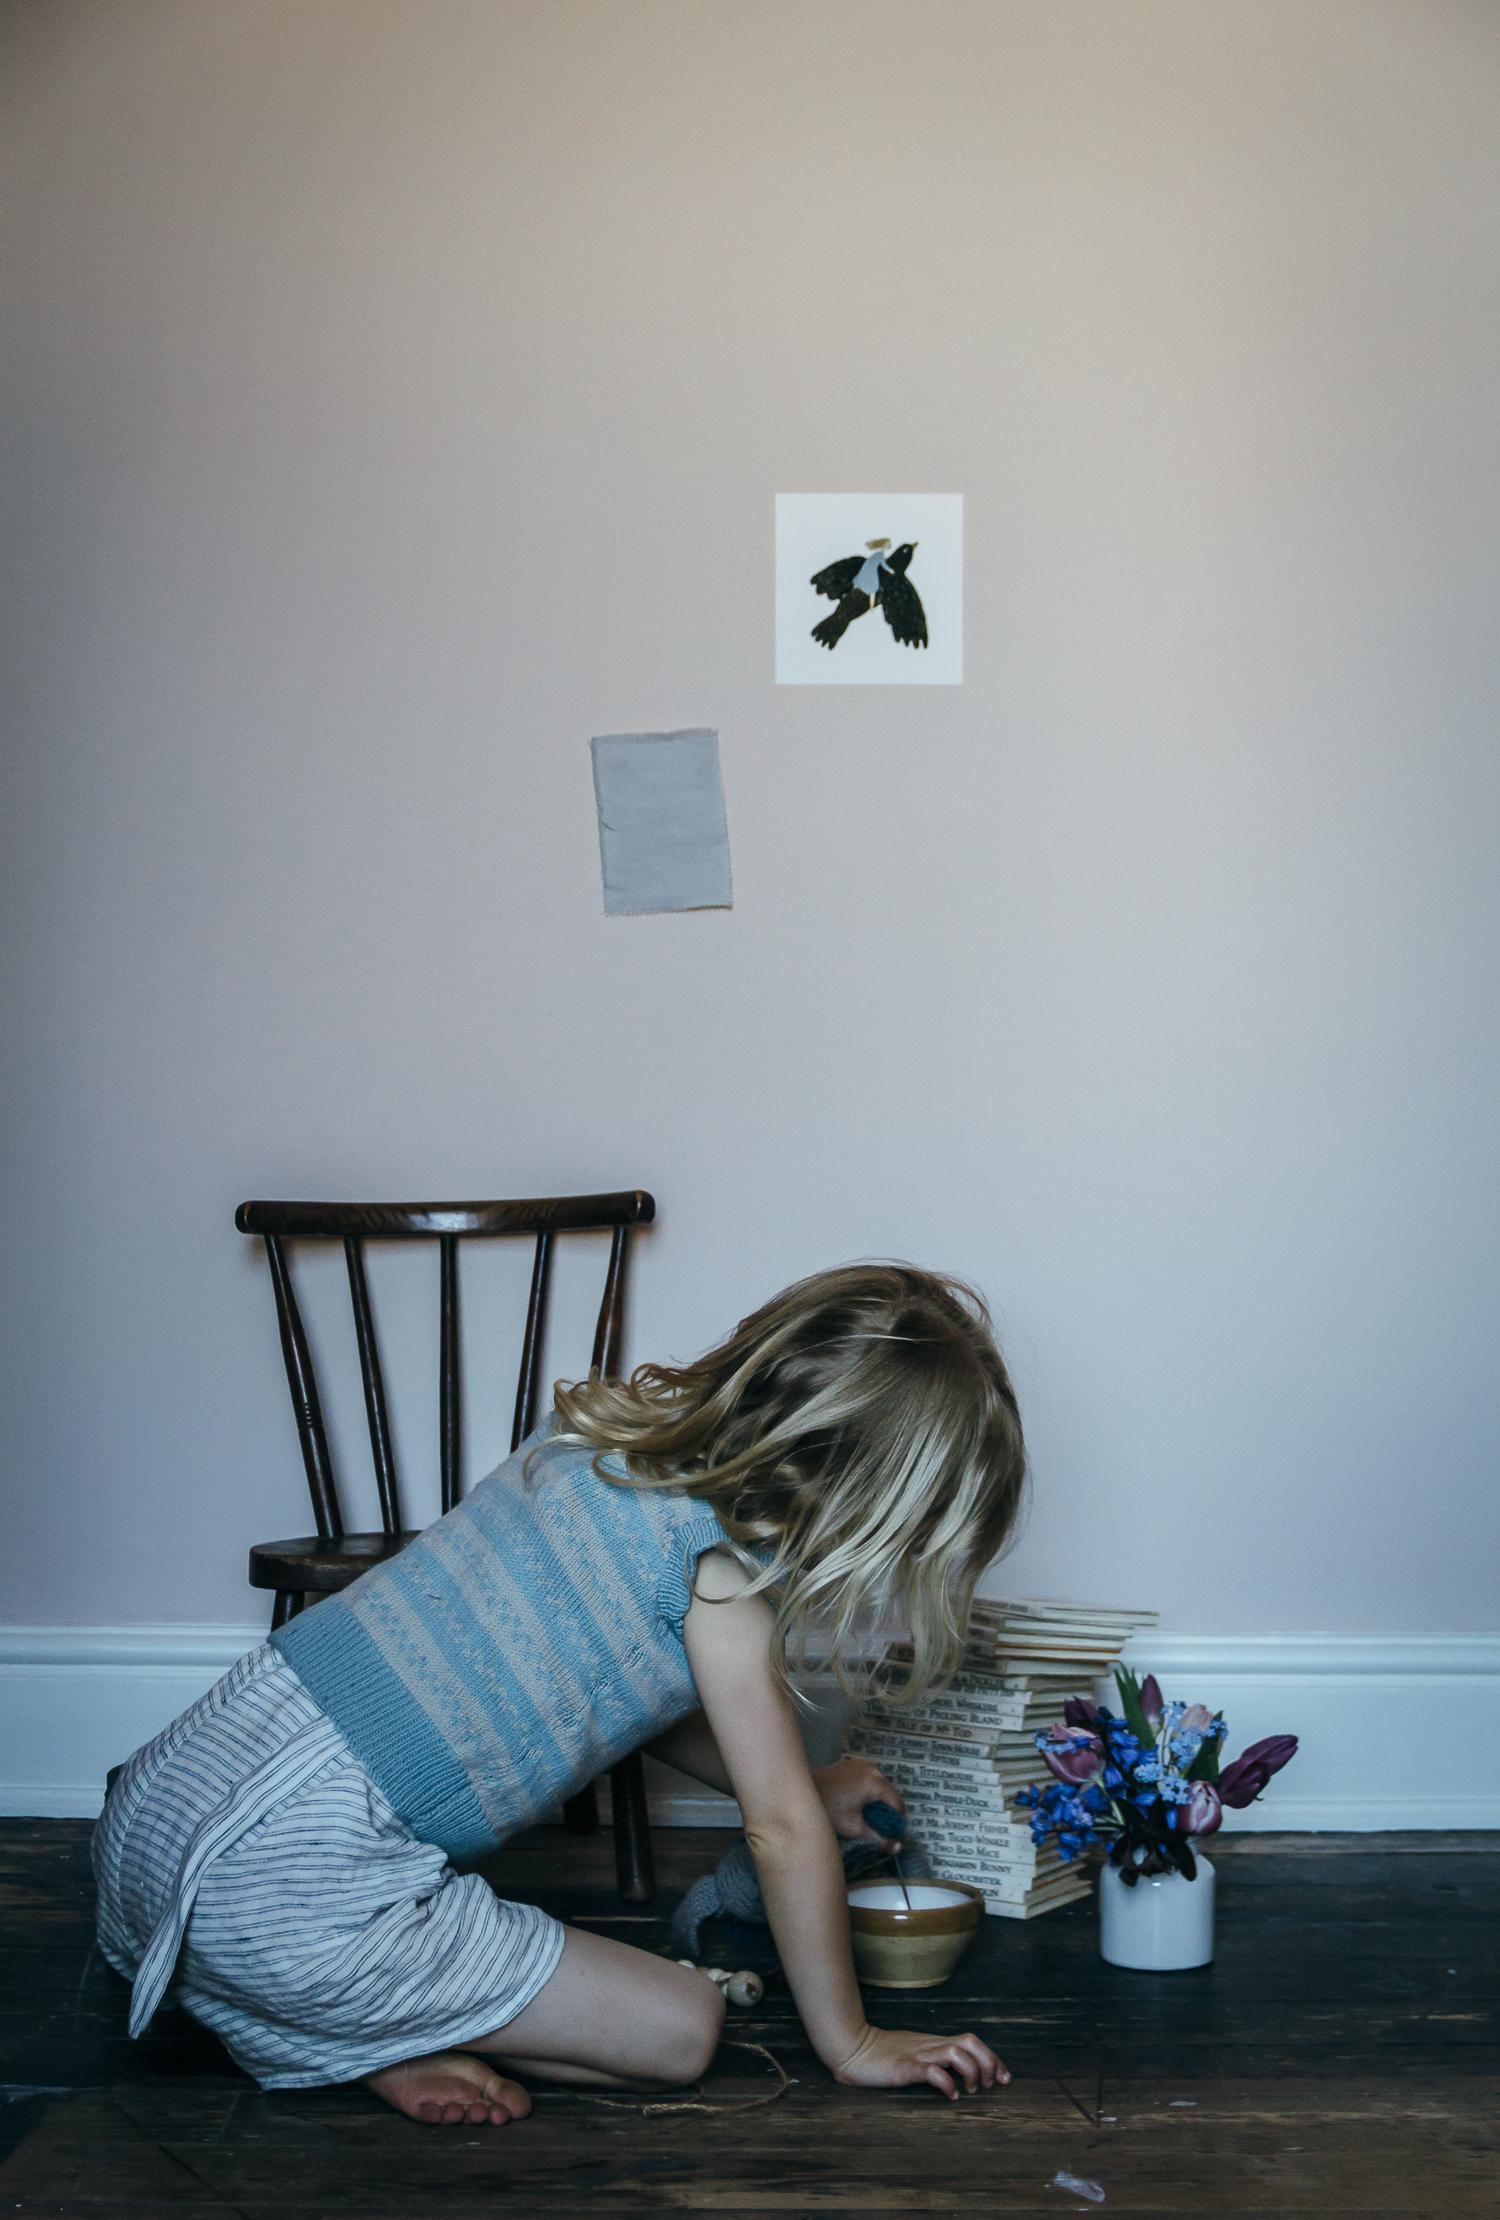 THE RENOVATION SO FAR: SIMPLE CHILDREN'S BEDROOM